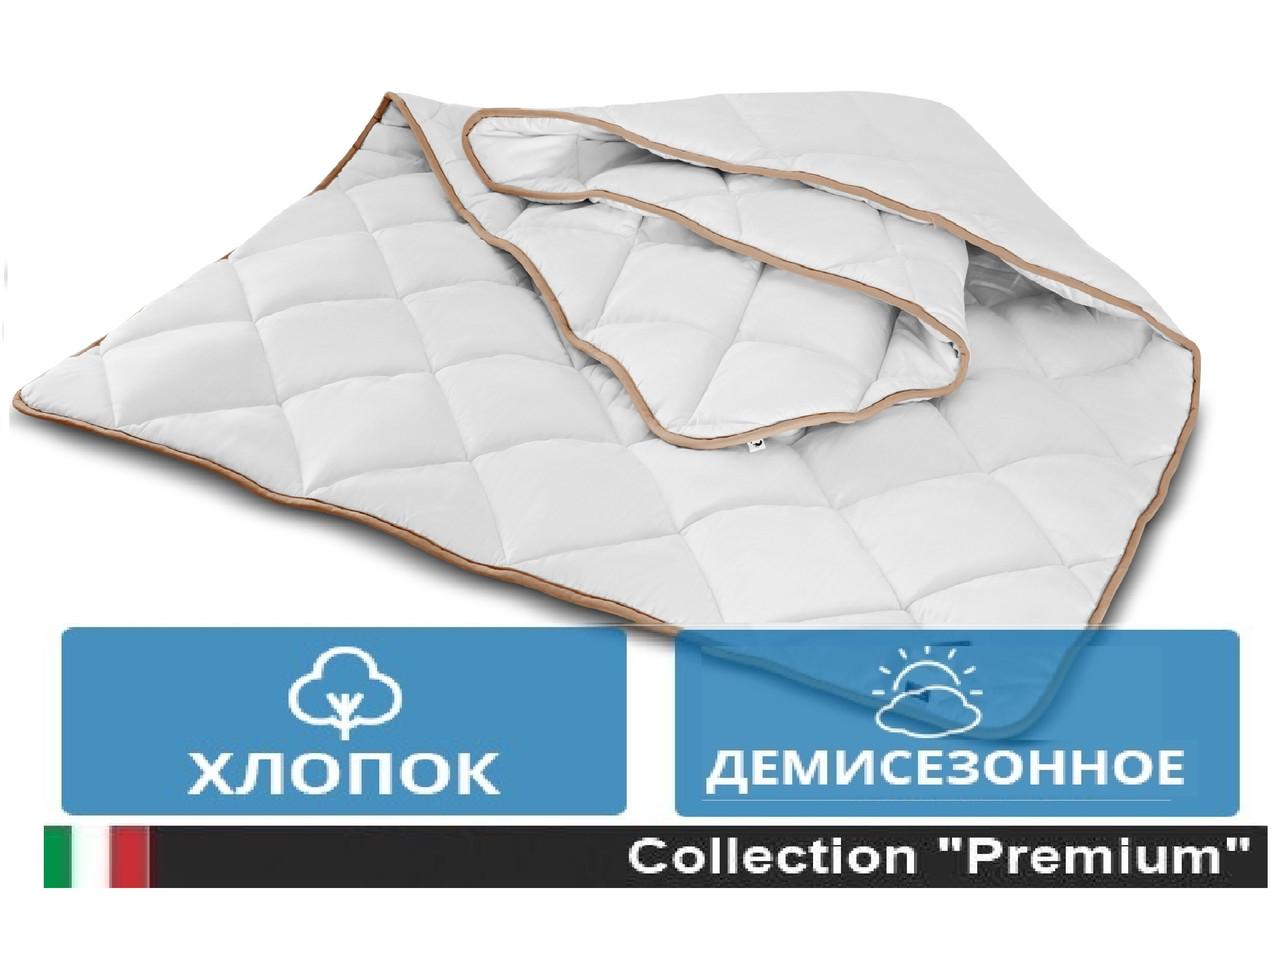 Одеяло двуспальное Евро Хлопок 200x220 Демисезон Royal Pearl  097